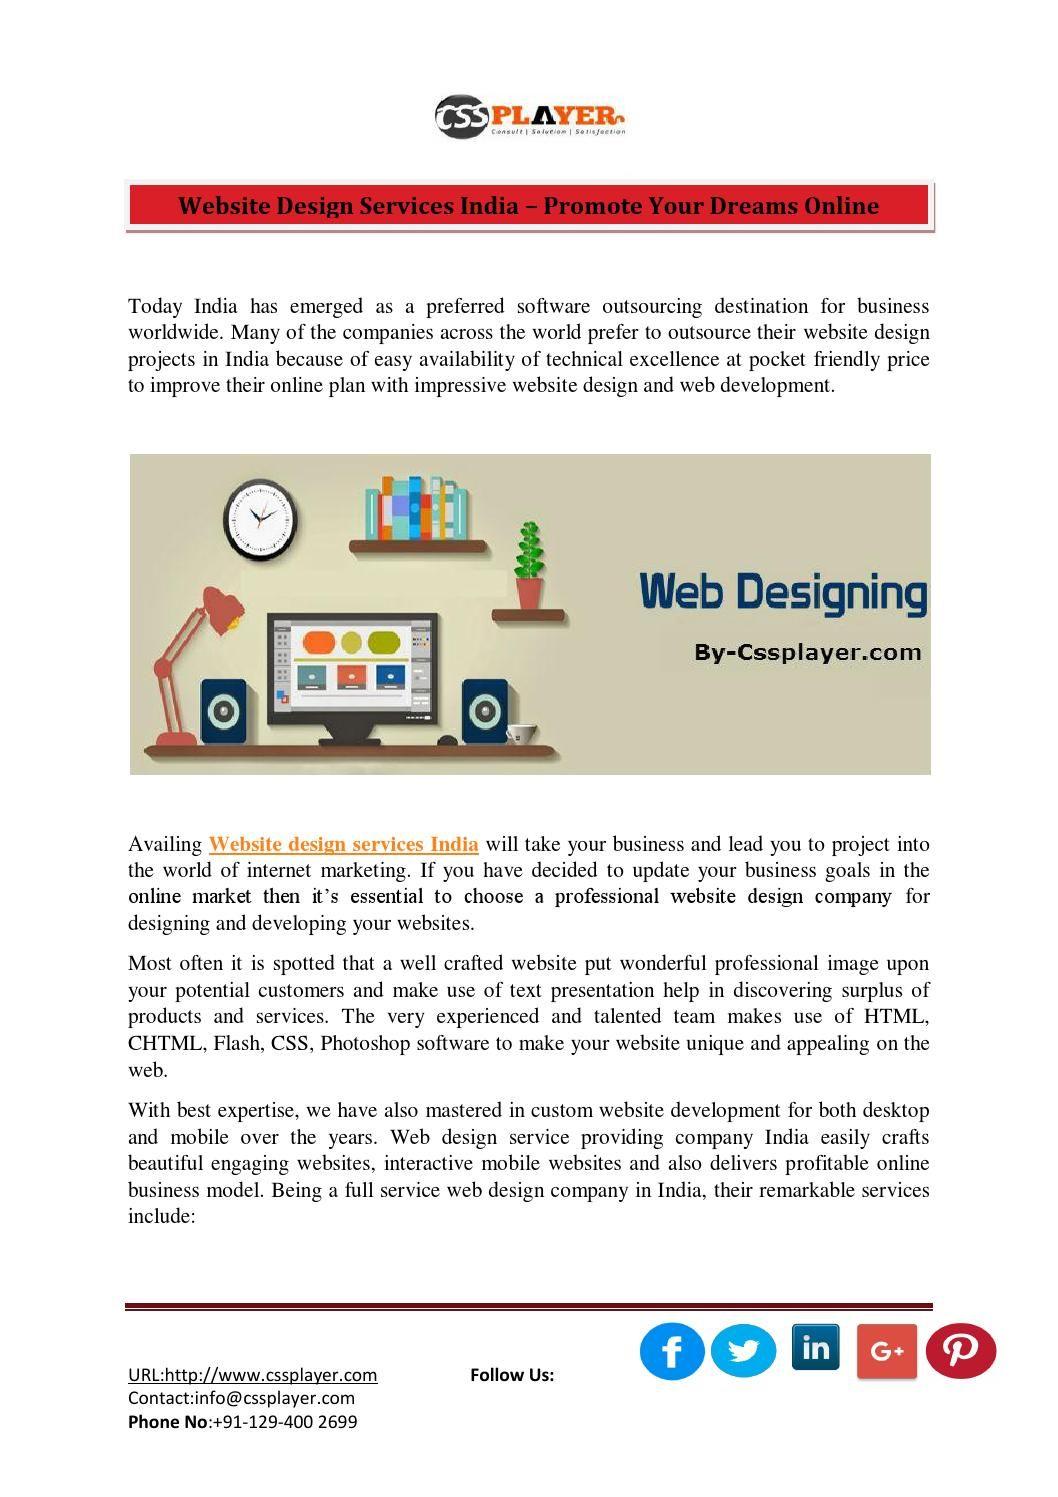 Website design services india – promote your dreams online   Pinterest